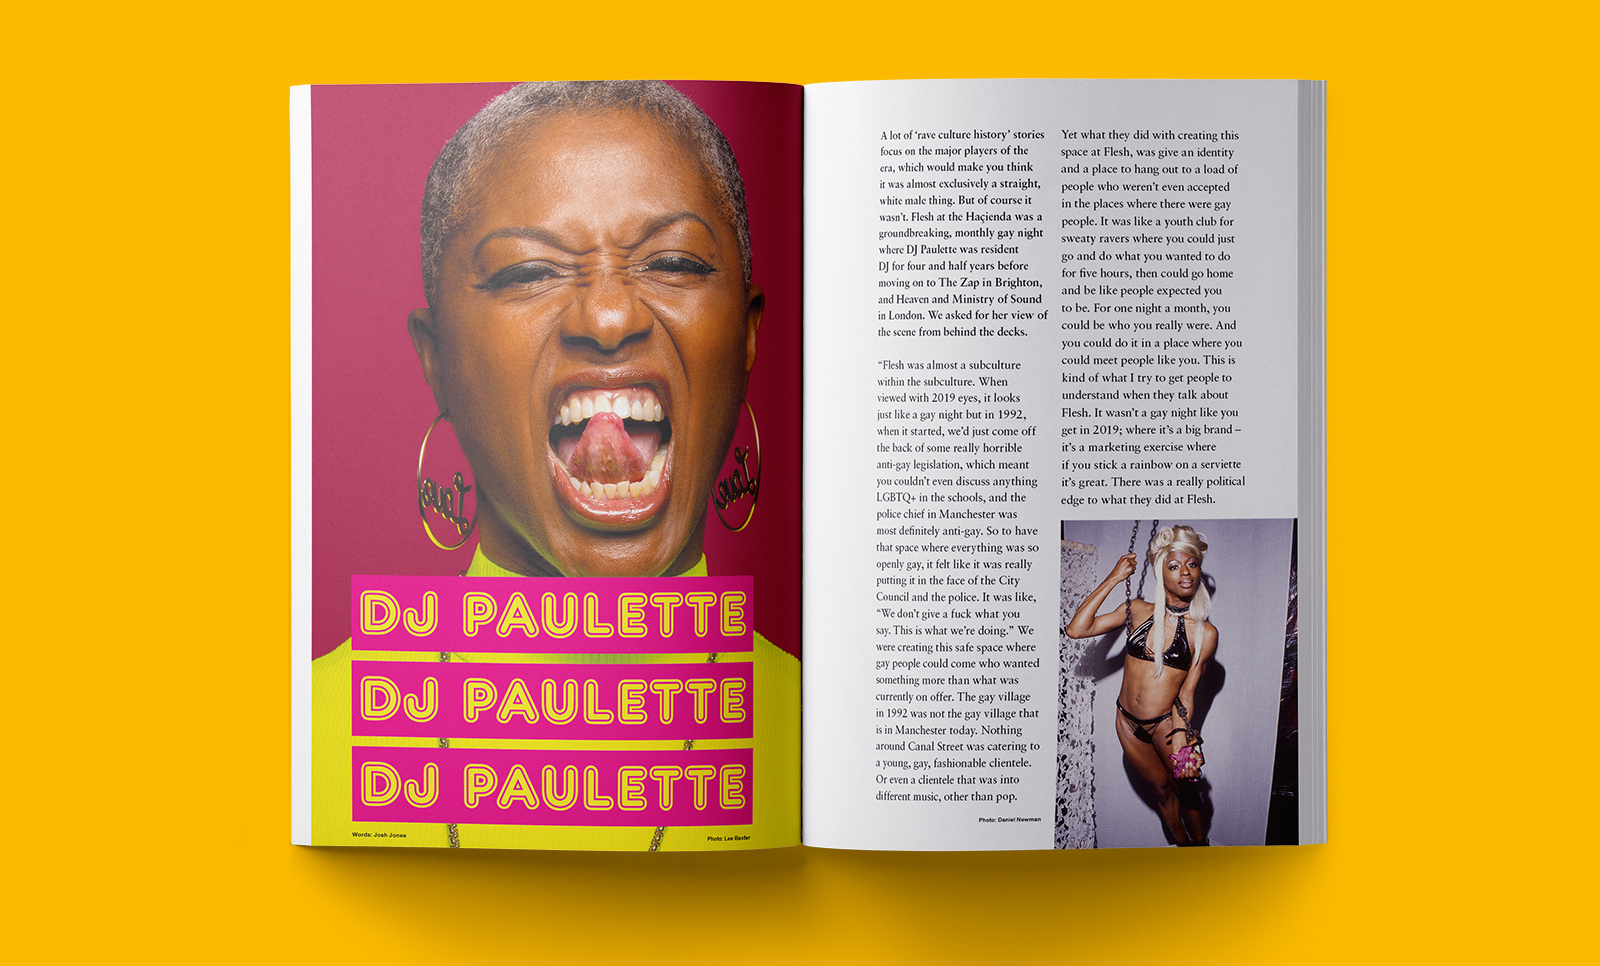 Sweet-Harmony-Saatchi-Gallery-Rave-Today-Book-DJ-Paulette-Pavement-Licker.jpg